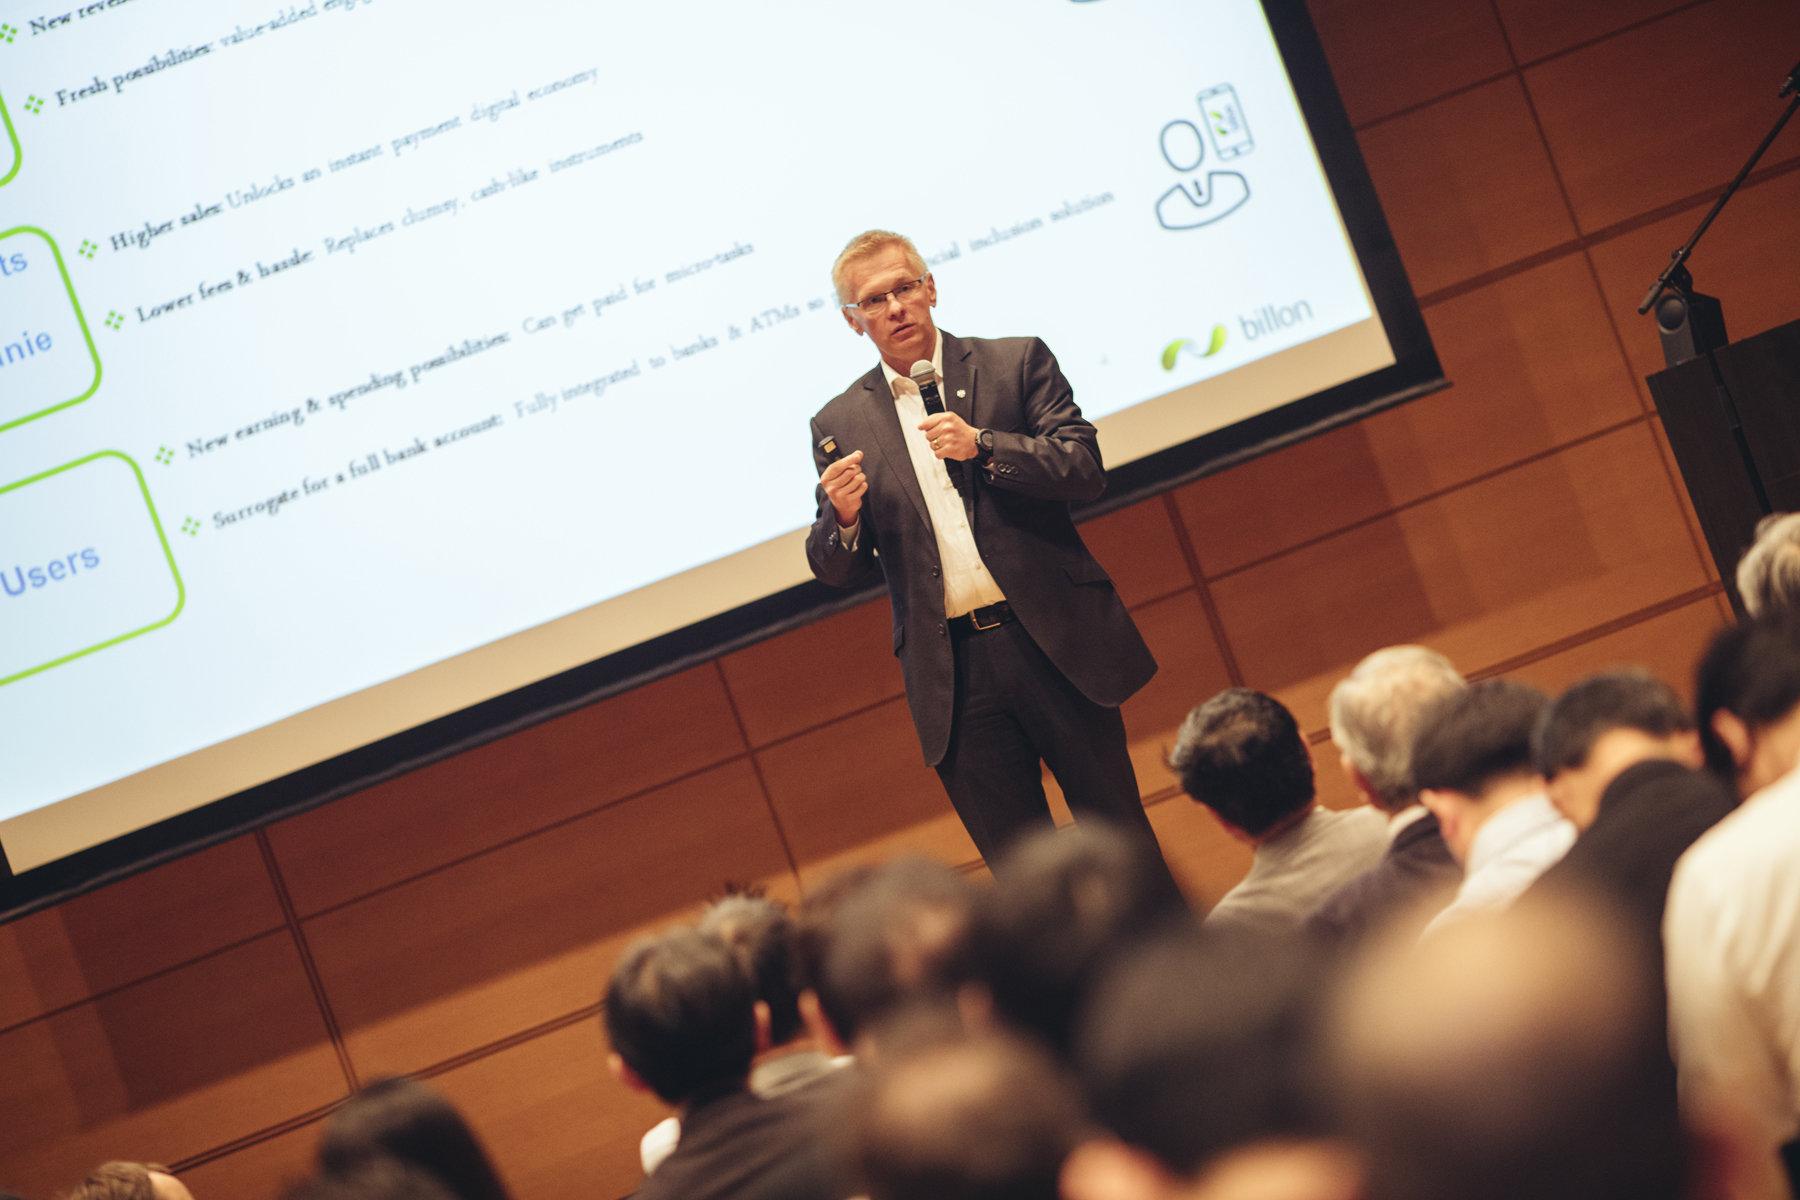 Billon reprezentuje polski sektor fintech w Tokio